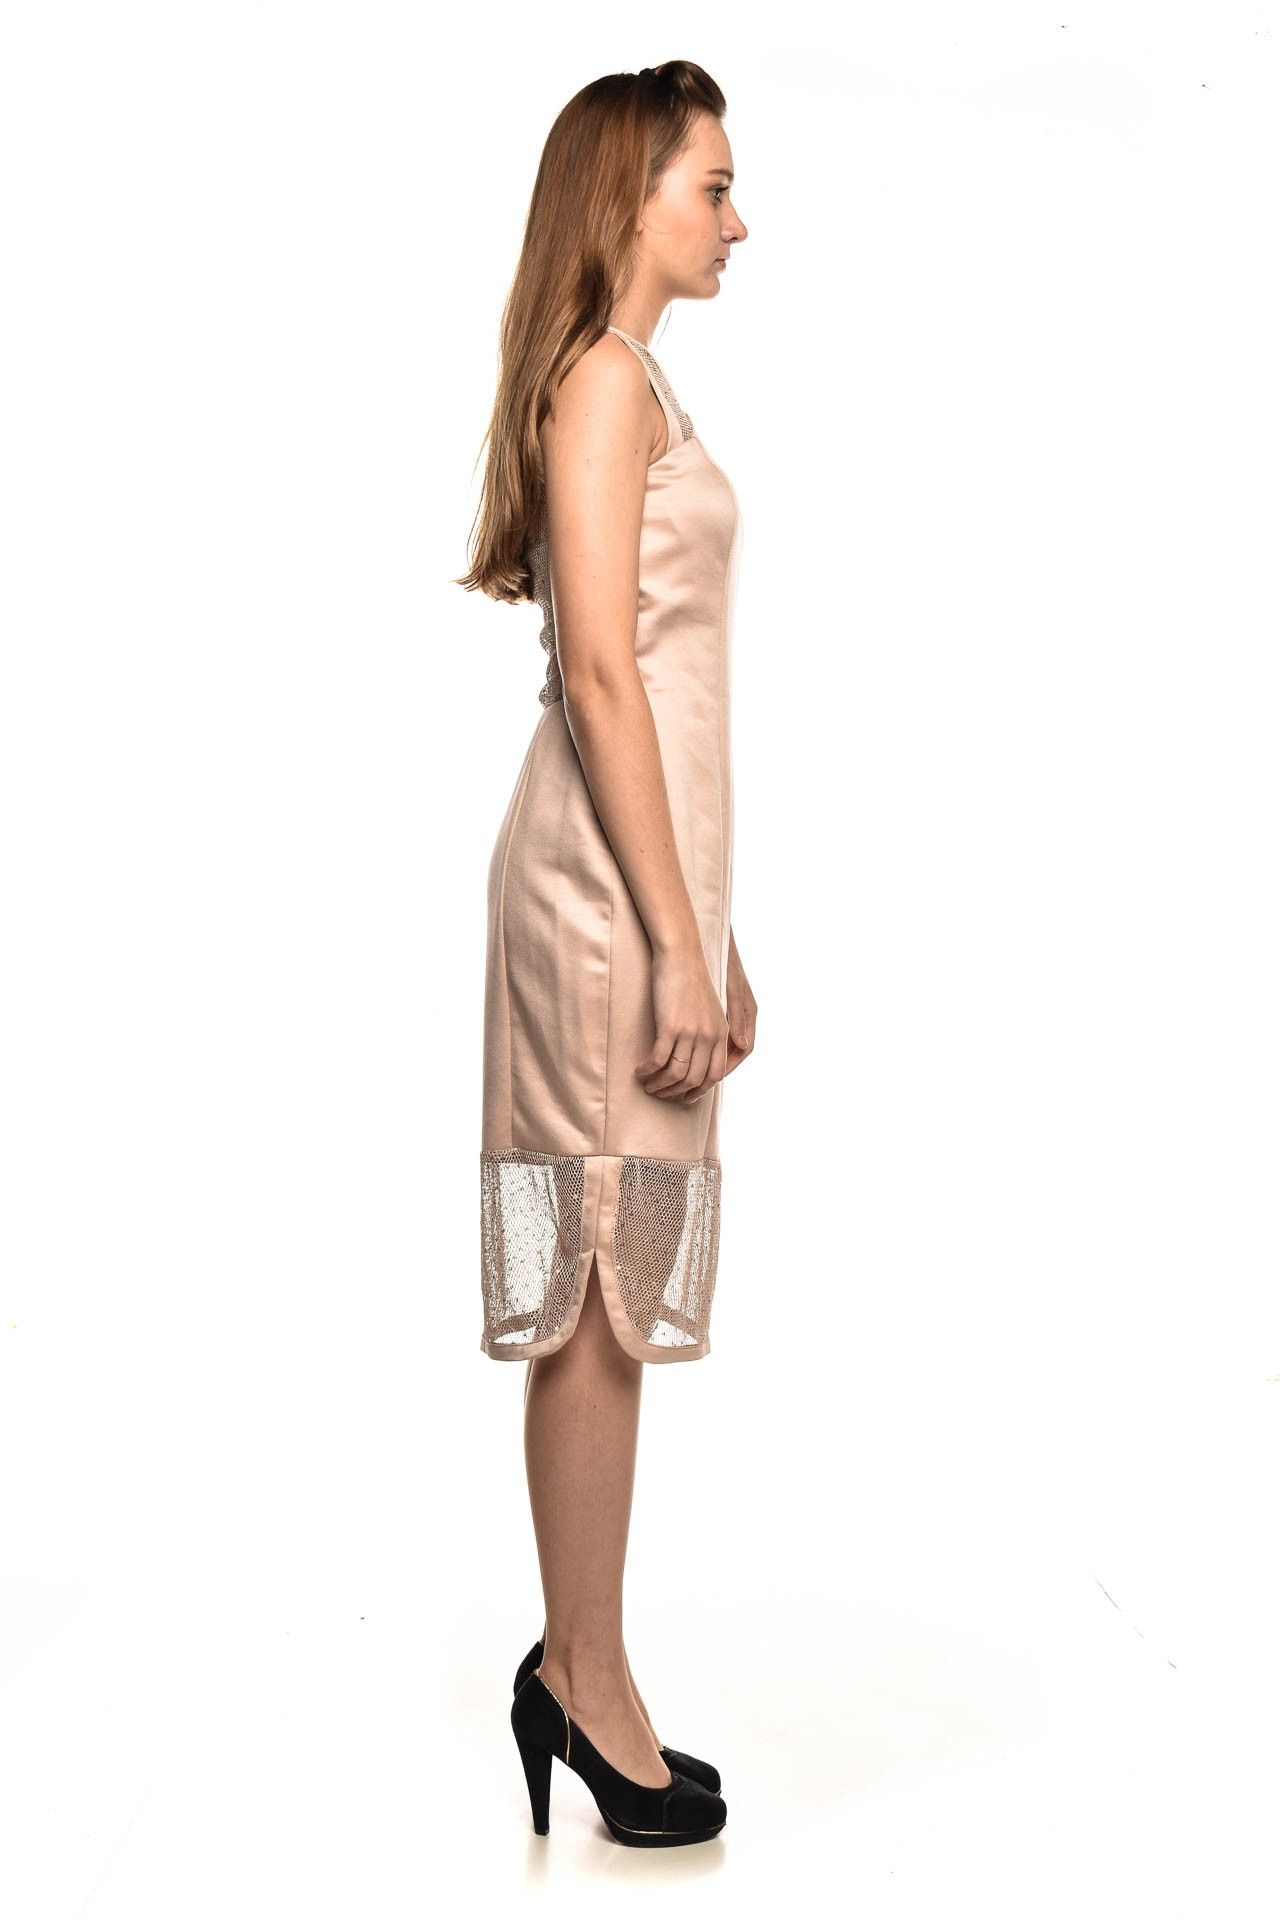 Strass - Vestido Rose Brilho - Foto 3